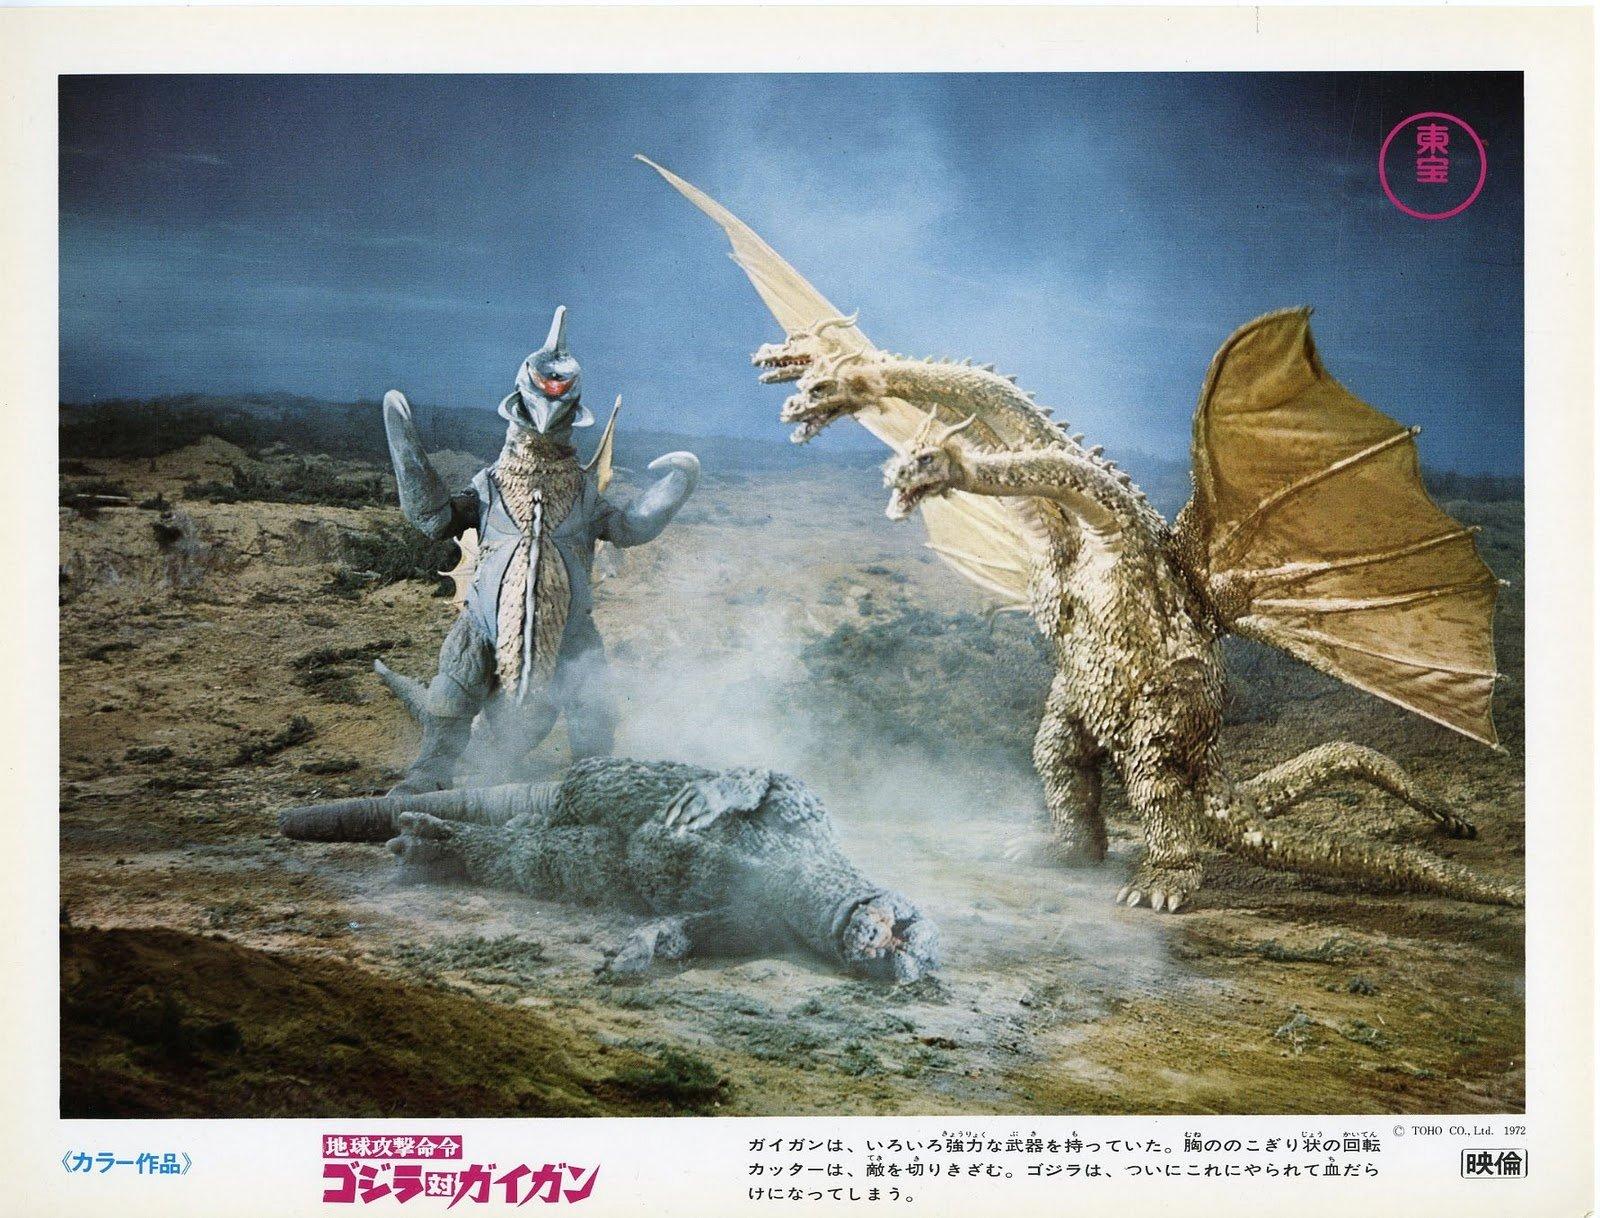 5 Godzilla vs Gigan HD Wallpapers Background Images   Wallpaper 1600x1218